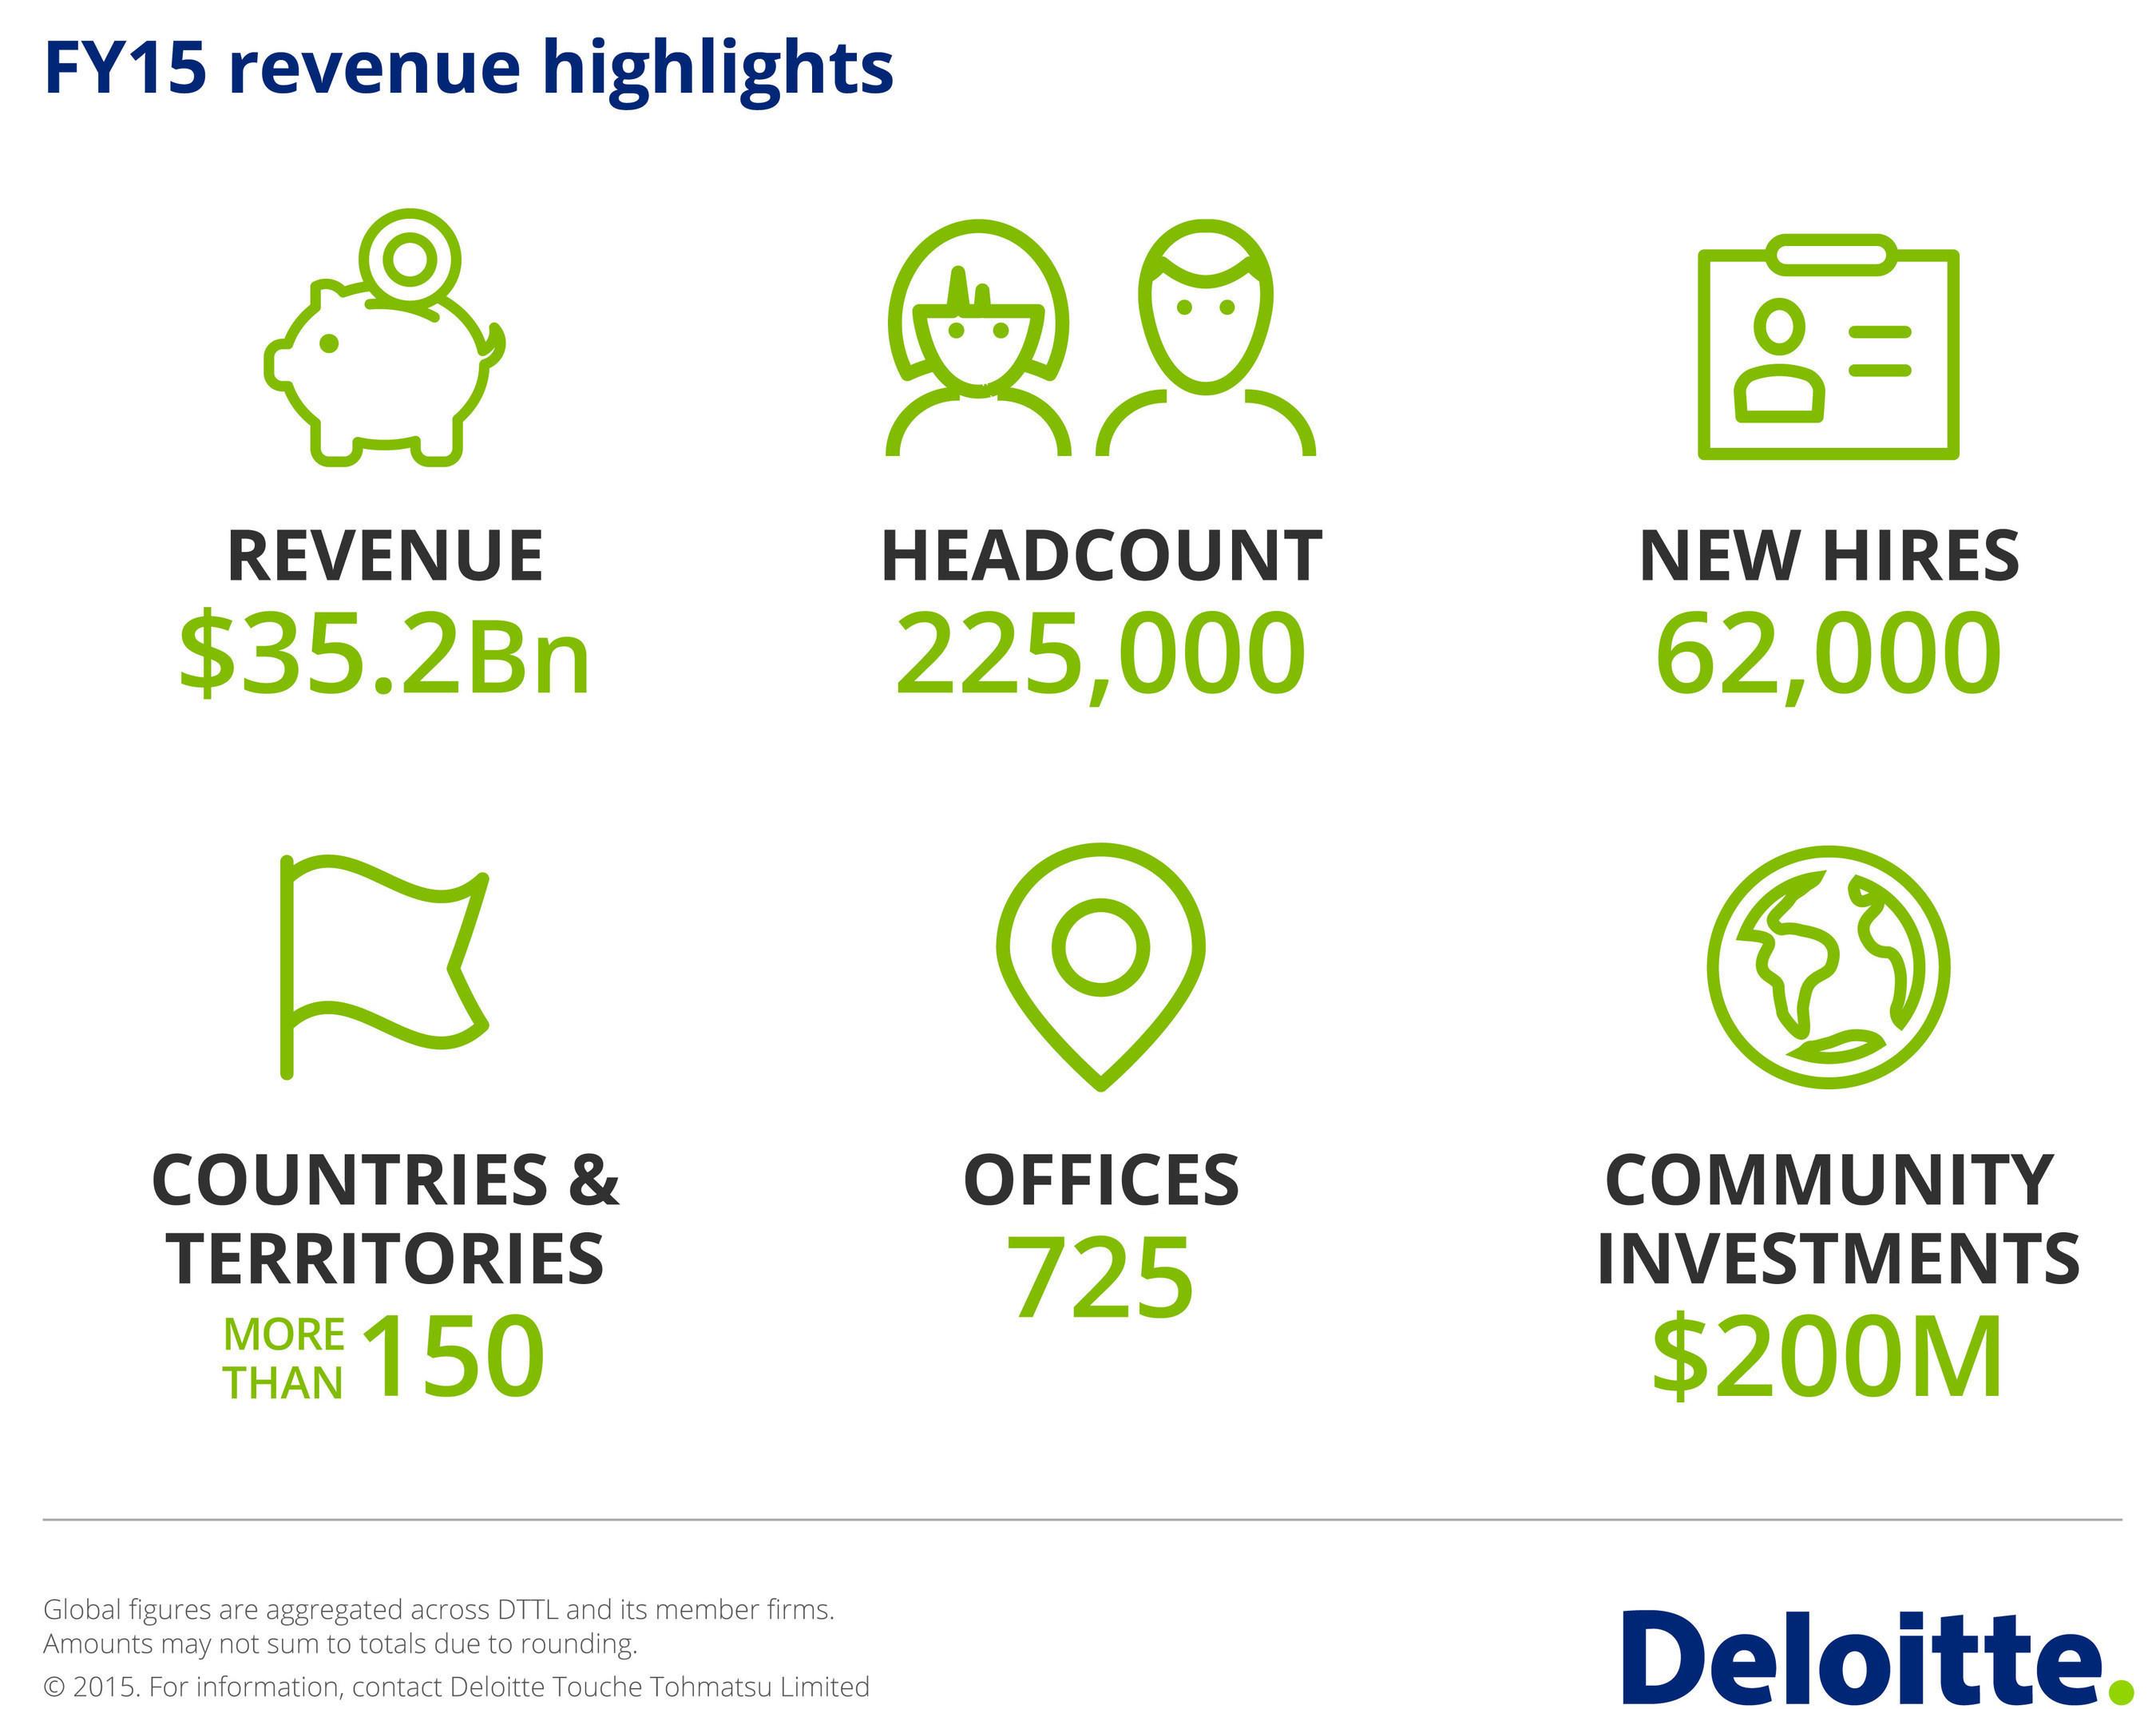 Deloitte anuncia receita de US$ 35,2 mil milhões